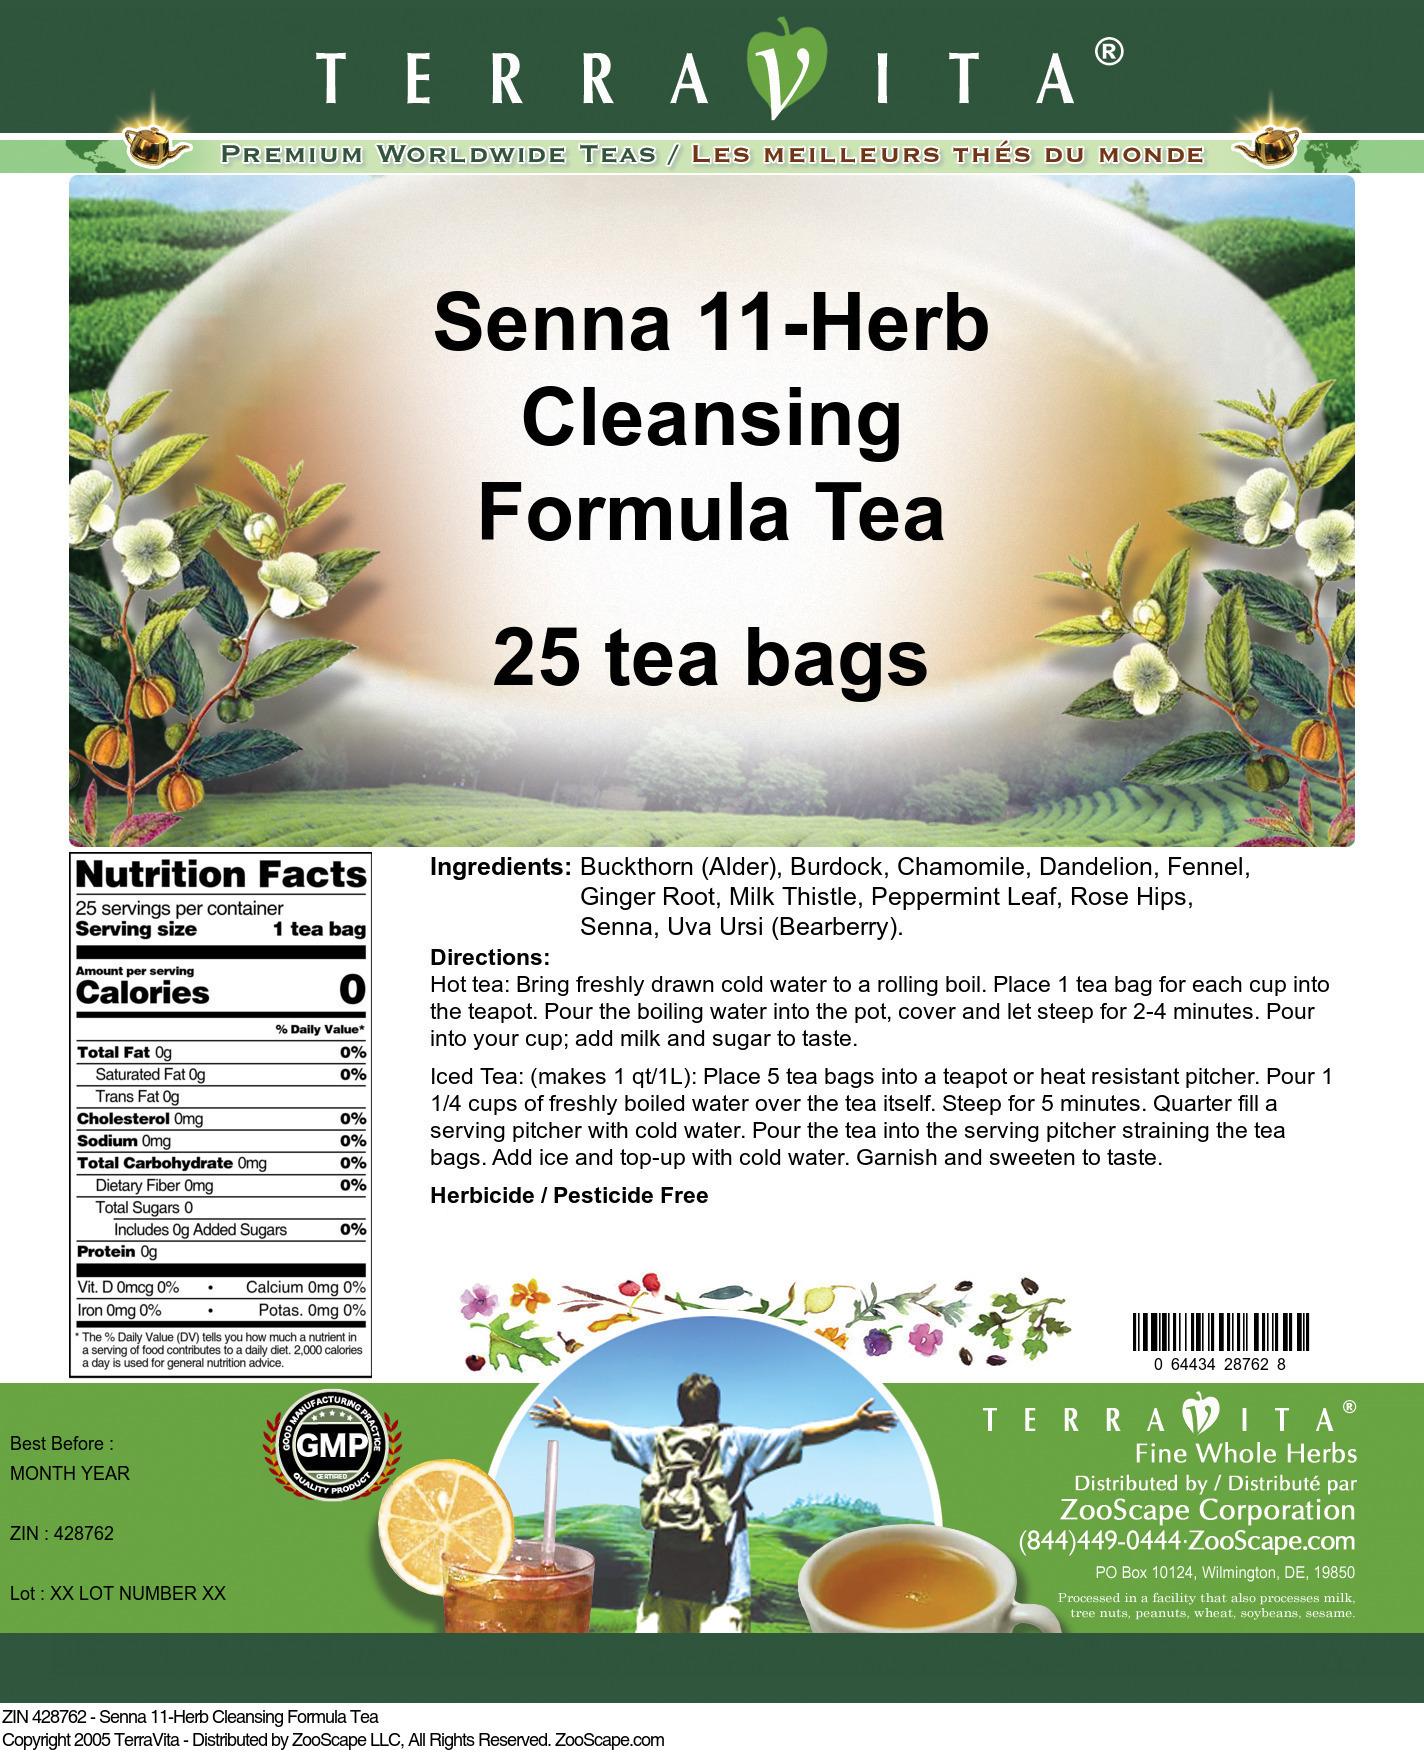 Senna 11-Herb Cleansing Formula